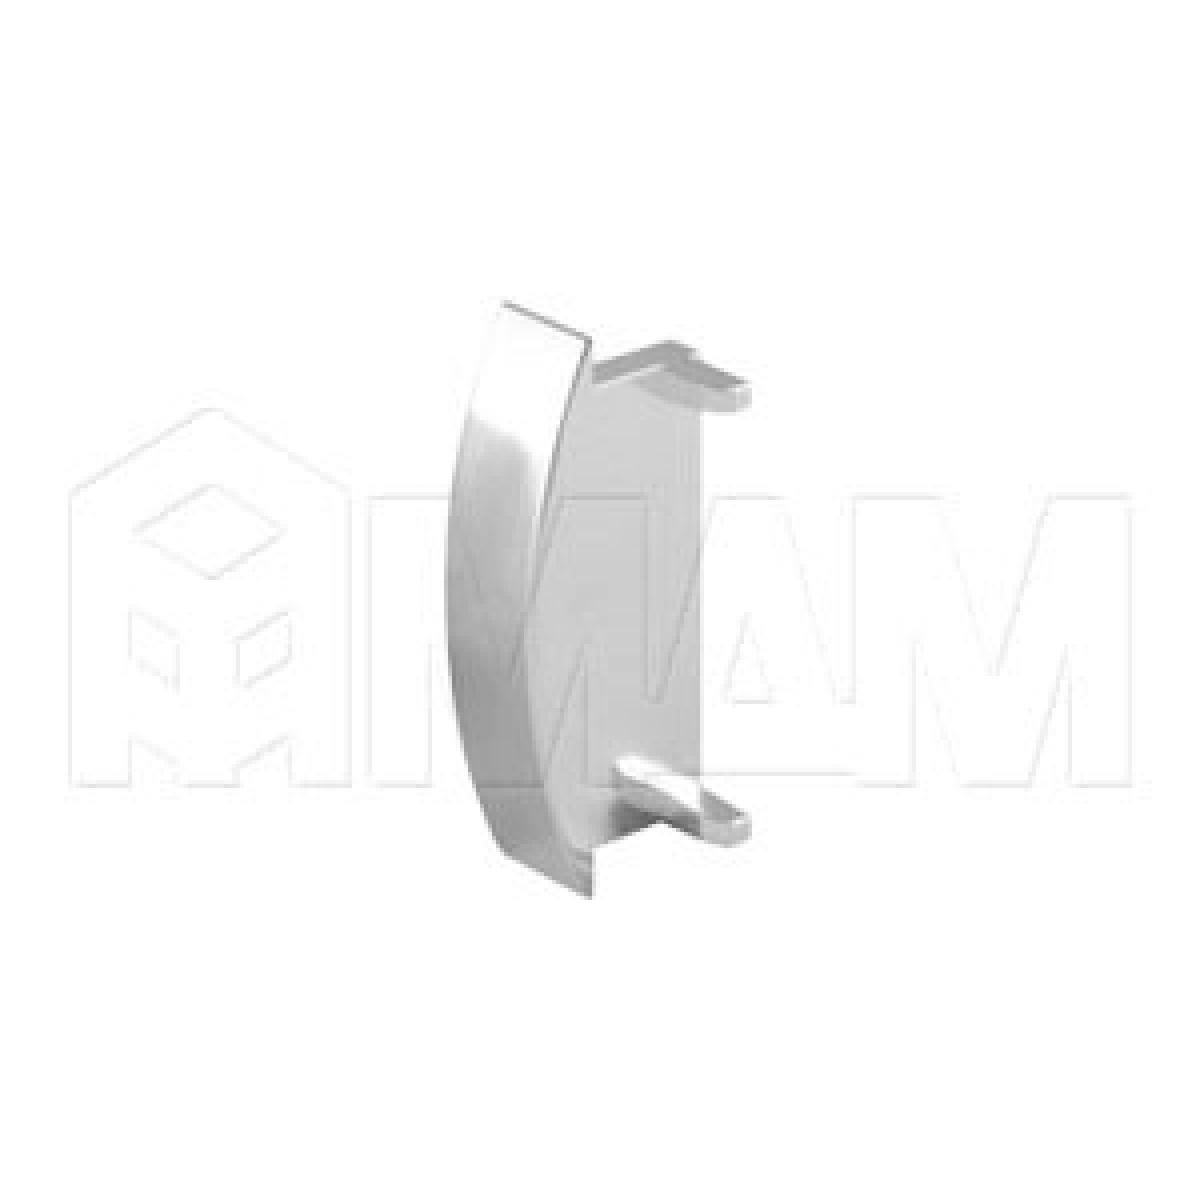 Торцевая заглушка для профиля PH.RU05 хром (1шт)